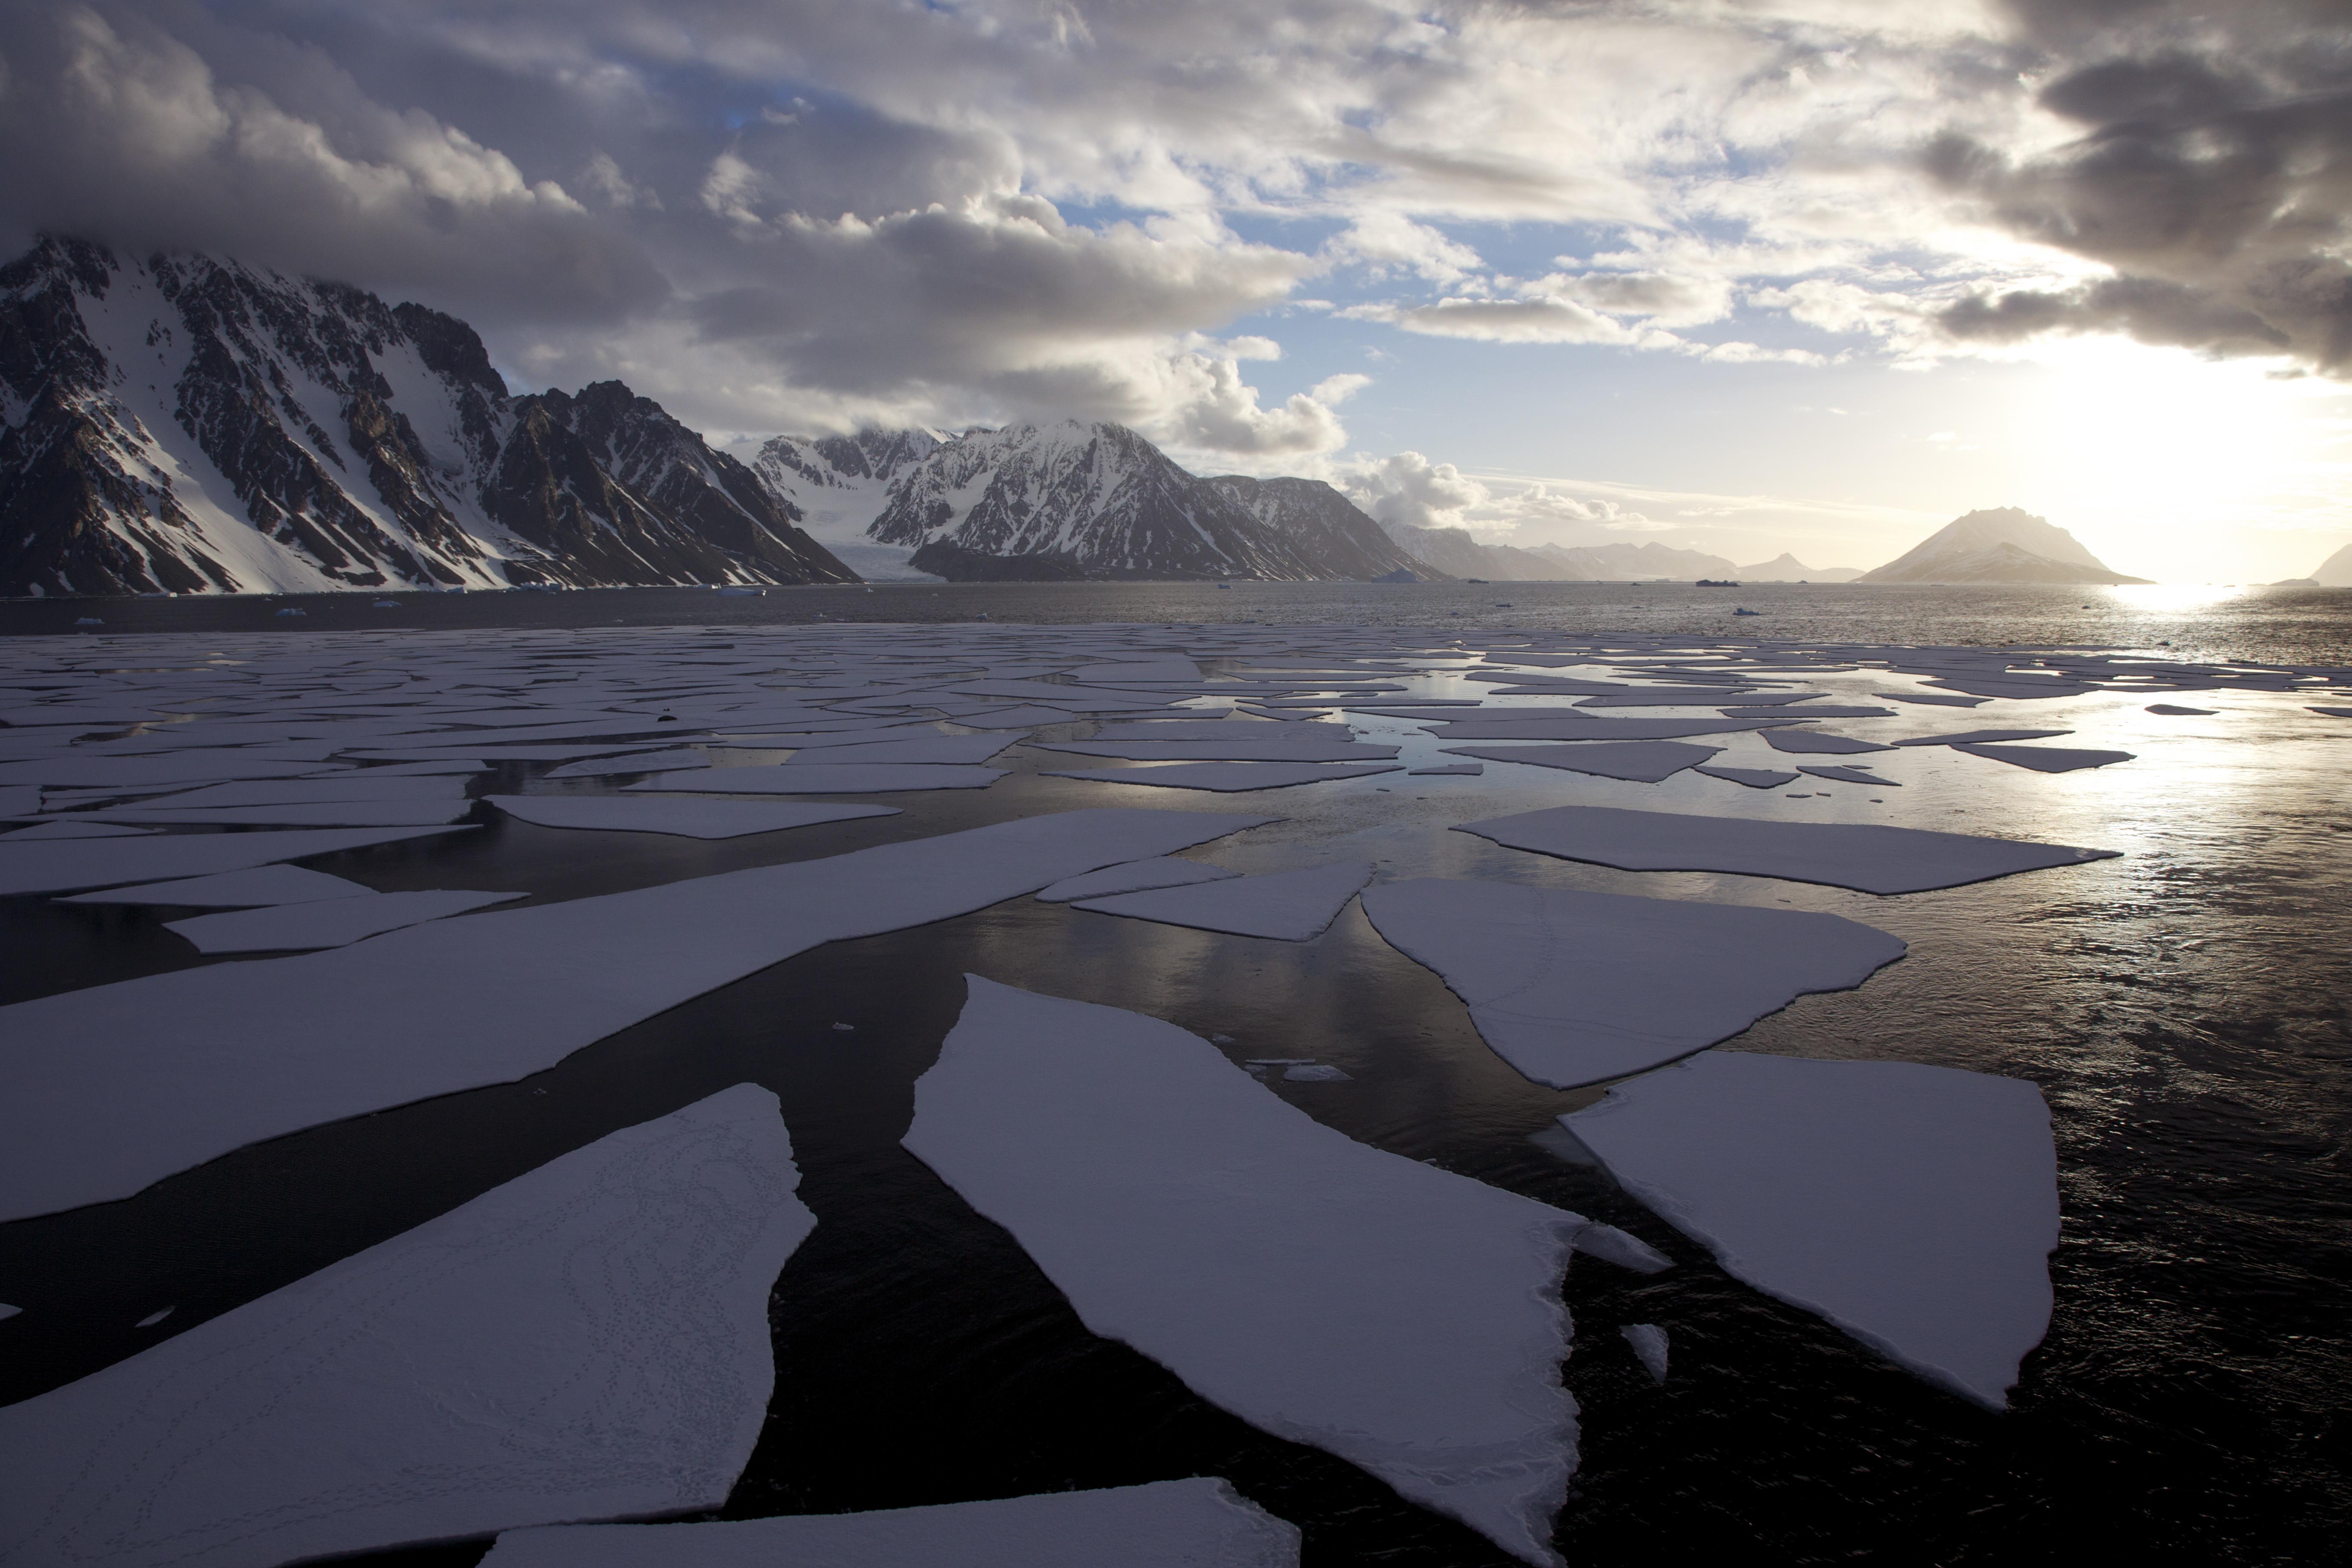 environmental impact of tourism on antarctica essay